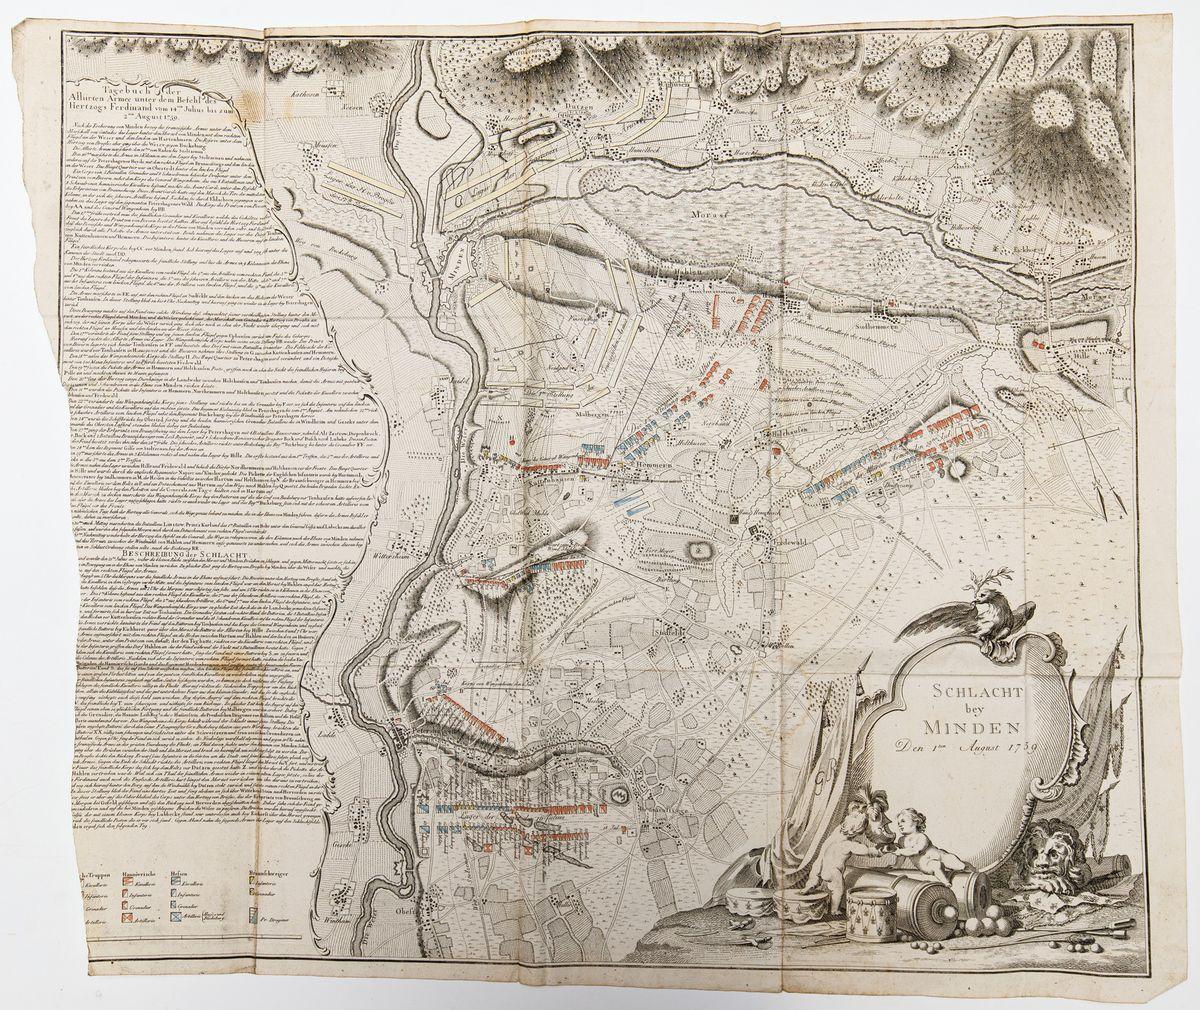 BITWA POD MINDEN, ok. 1775